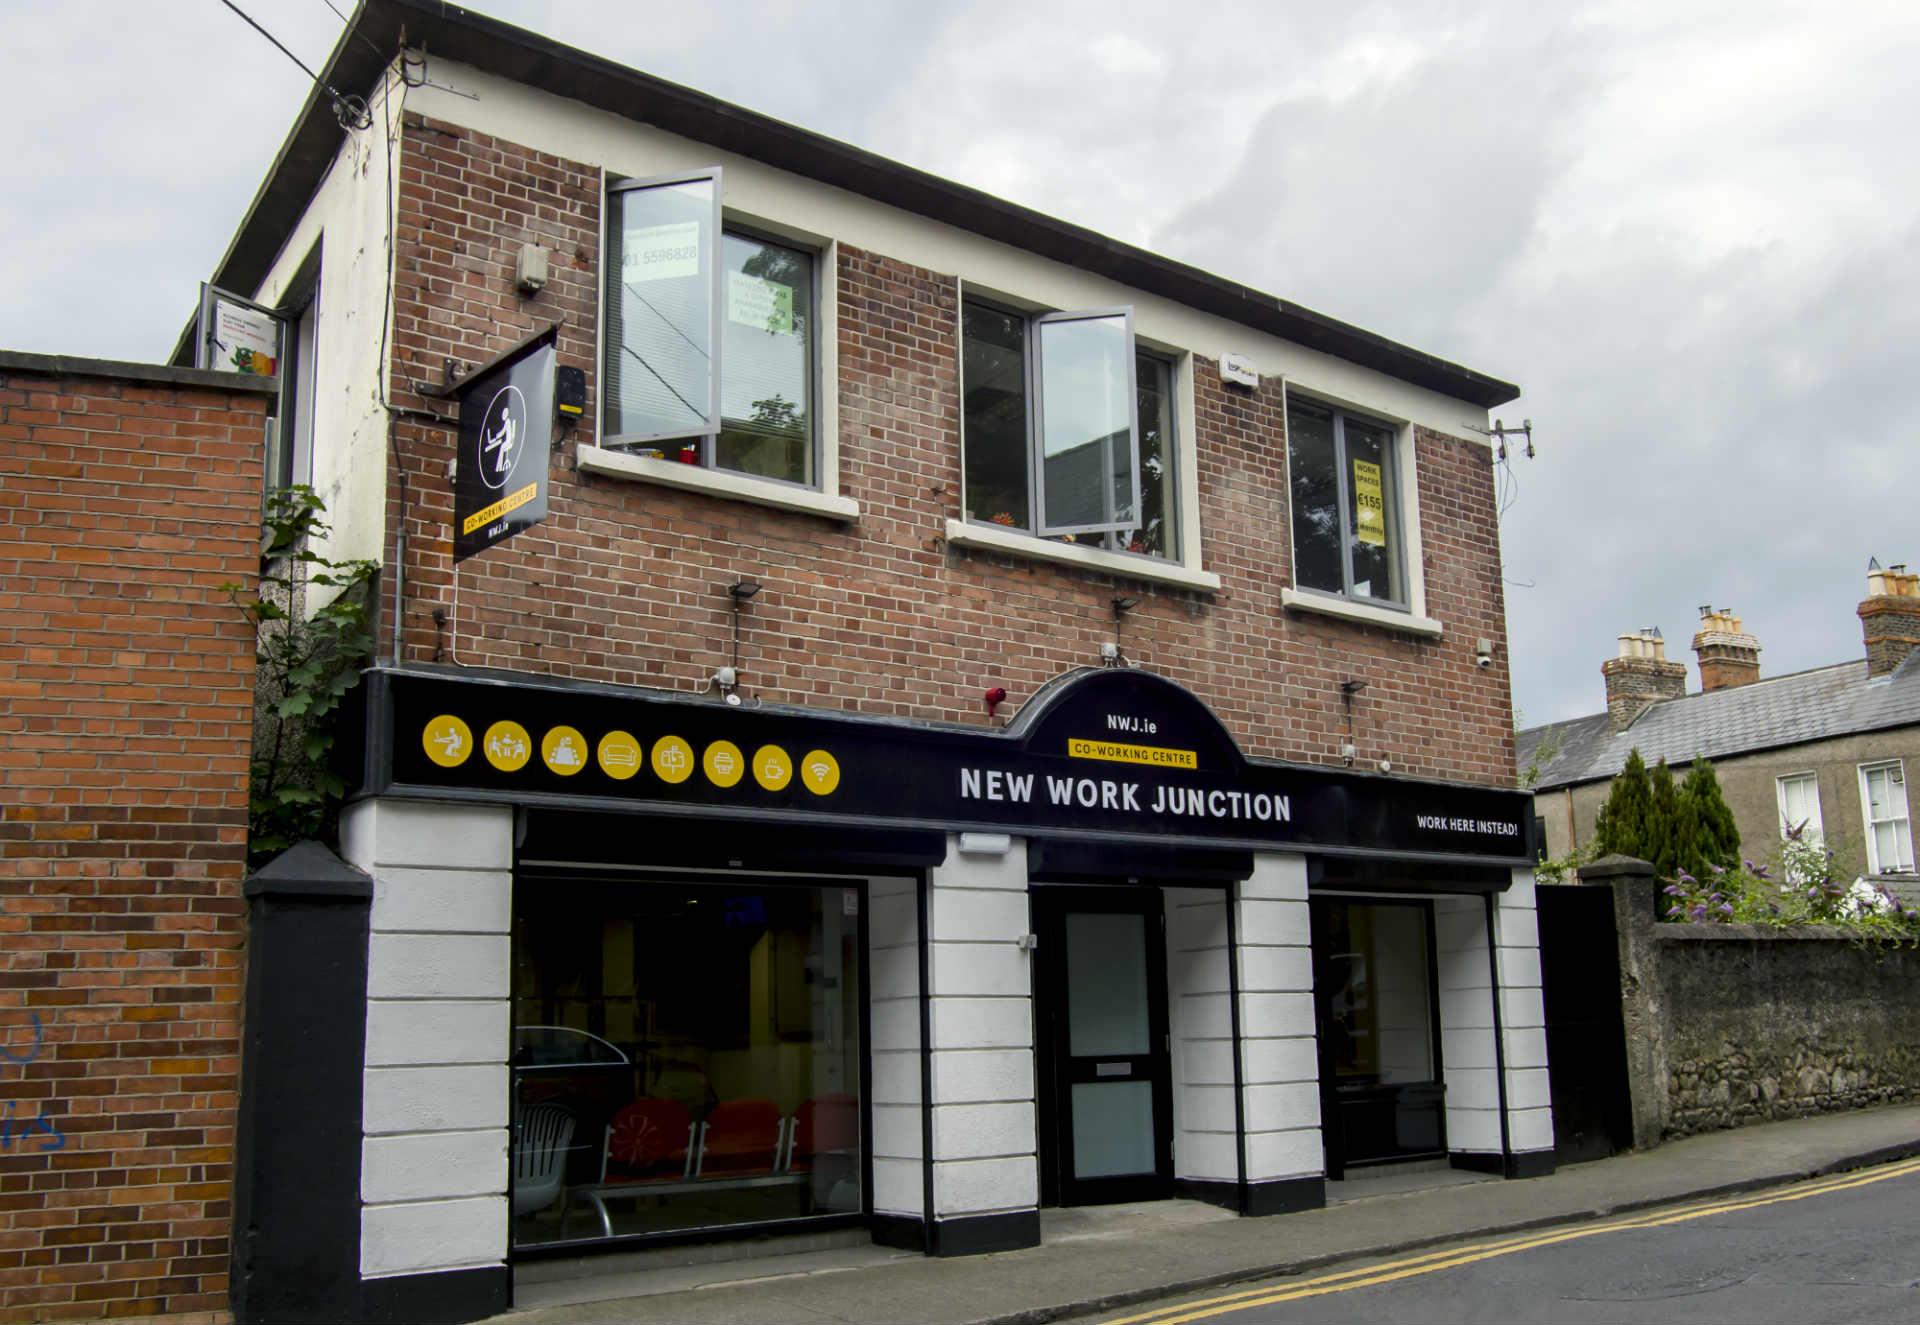 New Work Junction - Rathmines